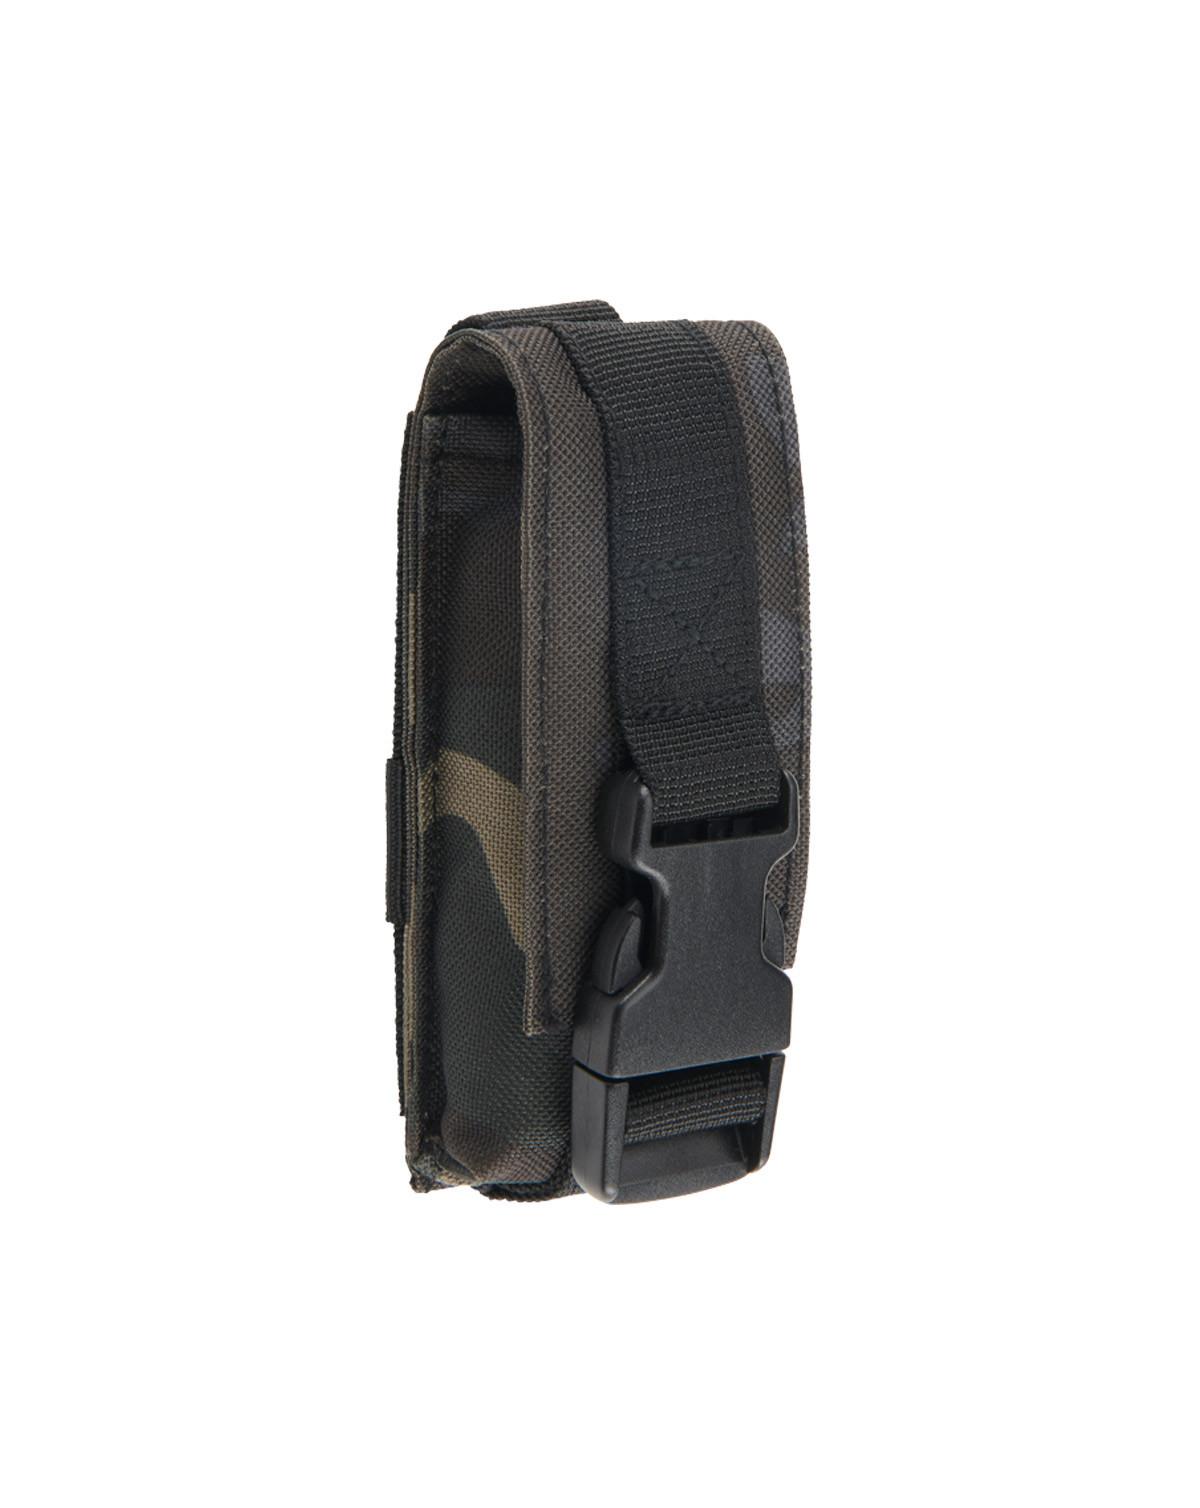 Brandit Molle Multi Pouch Medium (Dark Camo, One Size)